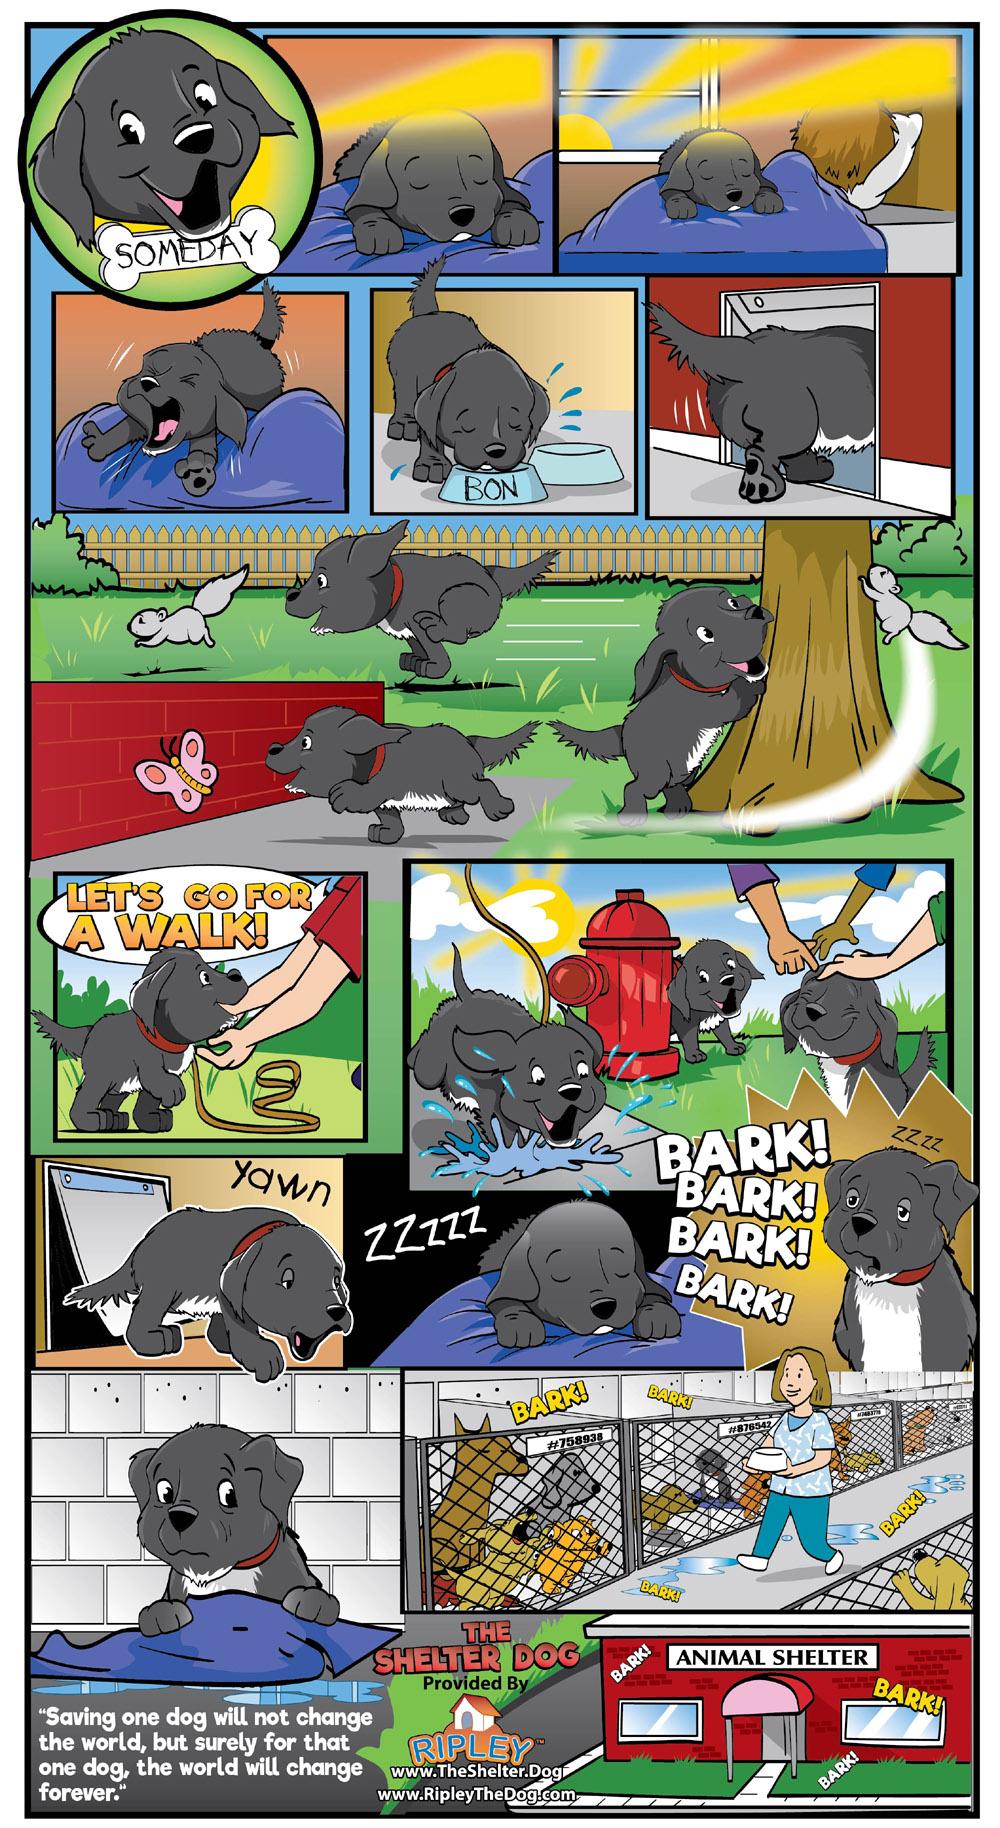 Bon The Shelter Dog in Someday